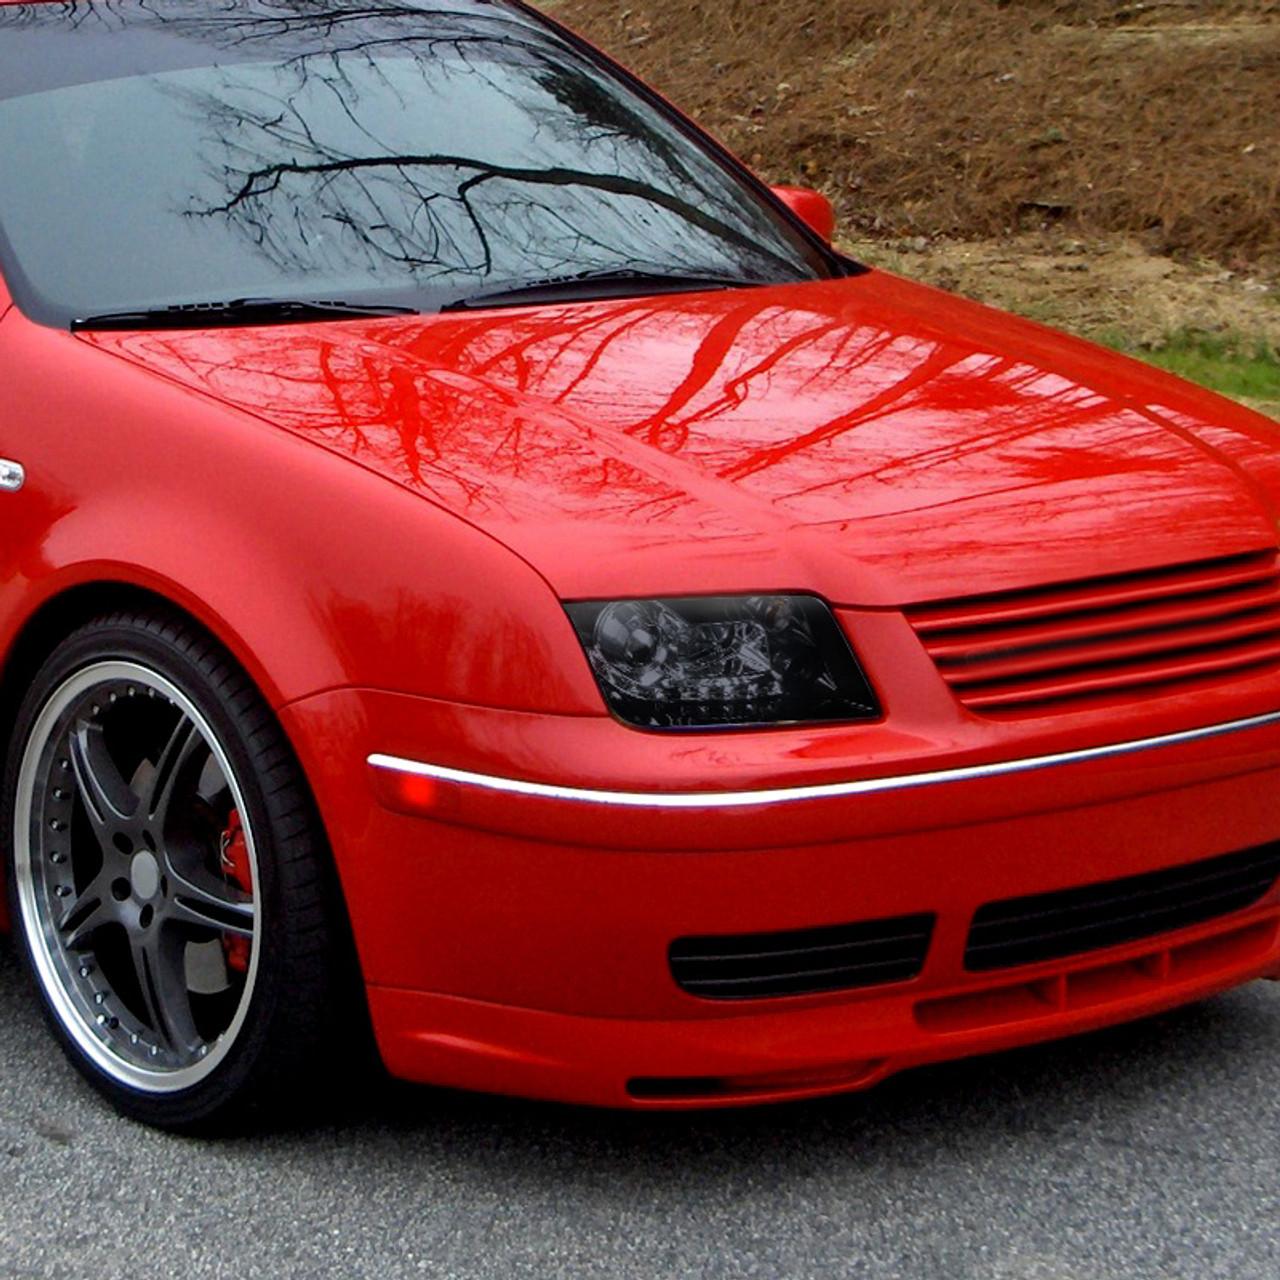 1999 2004 Volkswagen Jetta Bora R8 Style Led Drl Projector Headlights Glossy Black Housing Smoke Lens Spec D Tuning